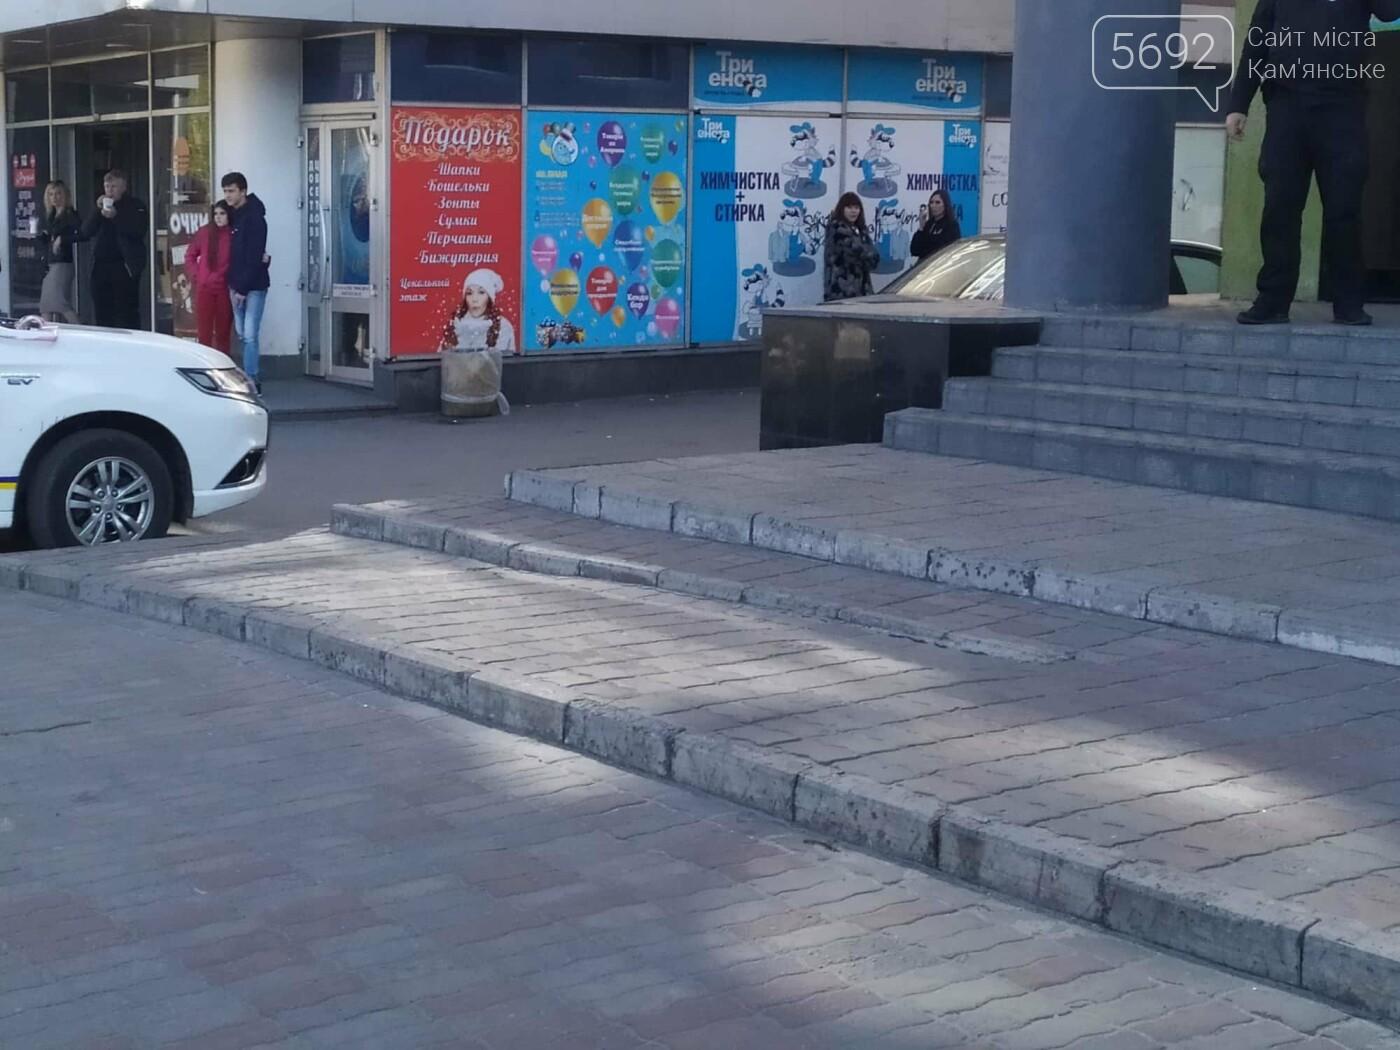 В  центре Каменского подстрелили активиста Евгения Найду, фото-5